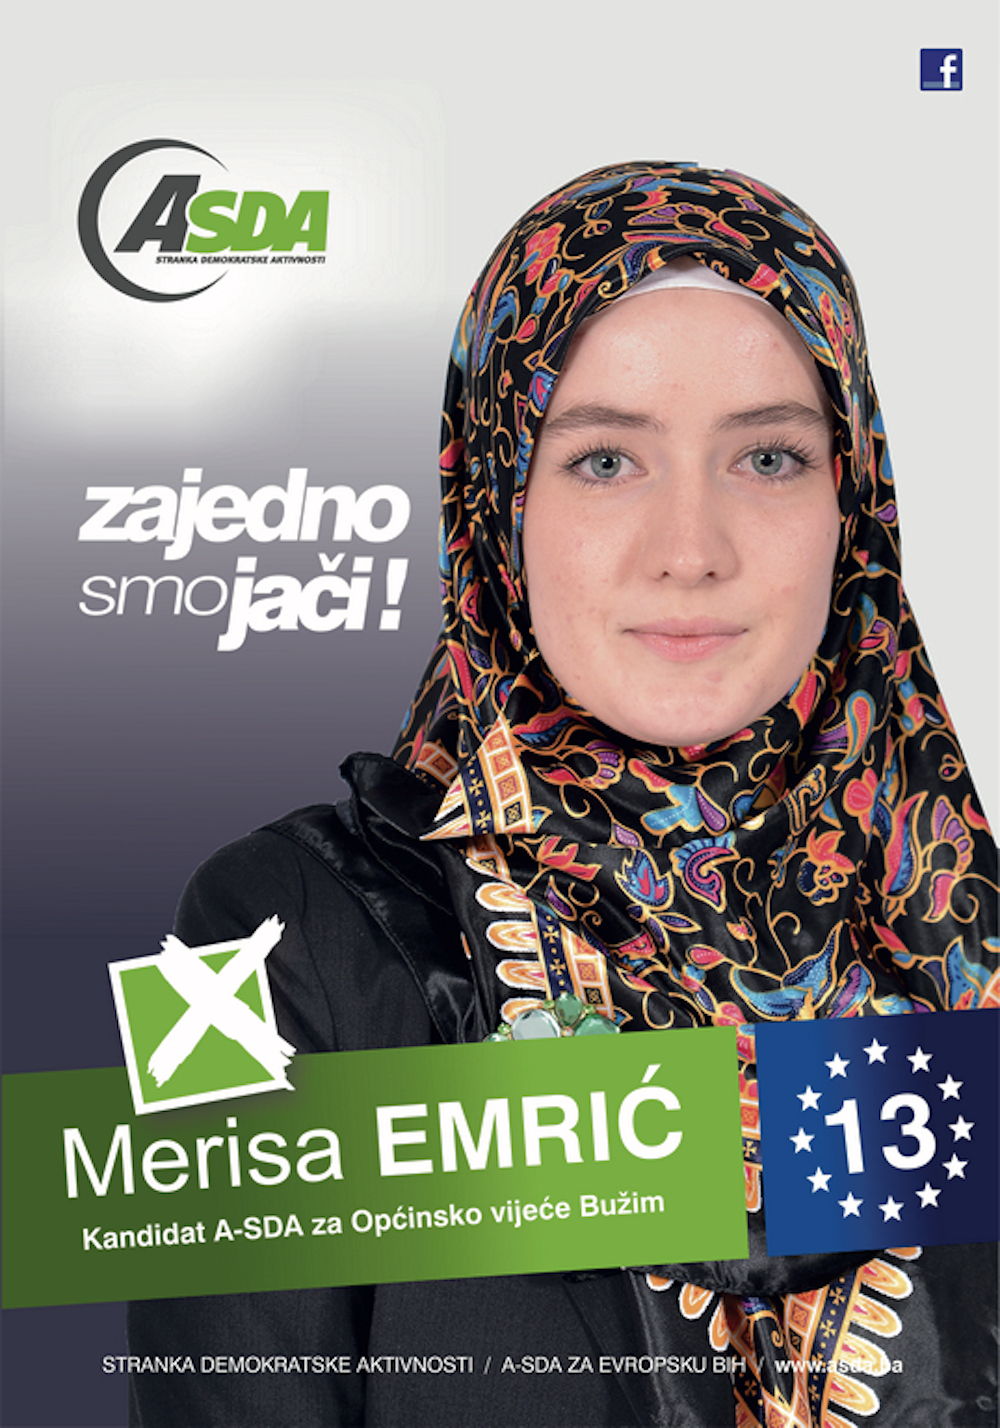 Merisa Emrić